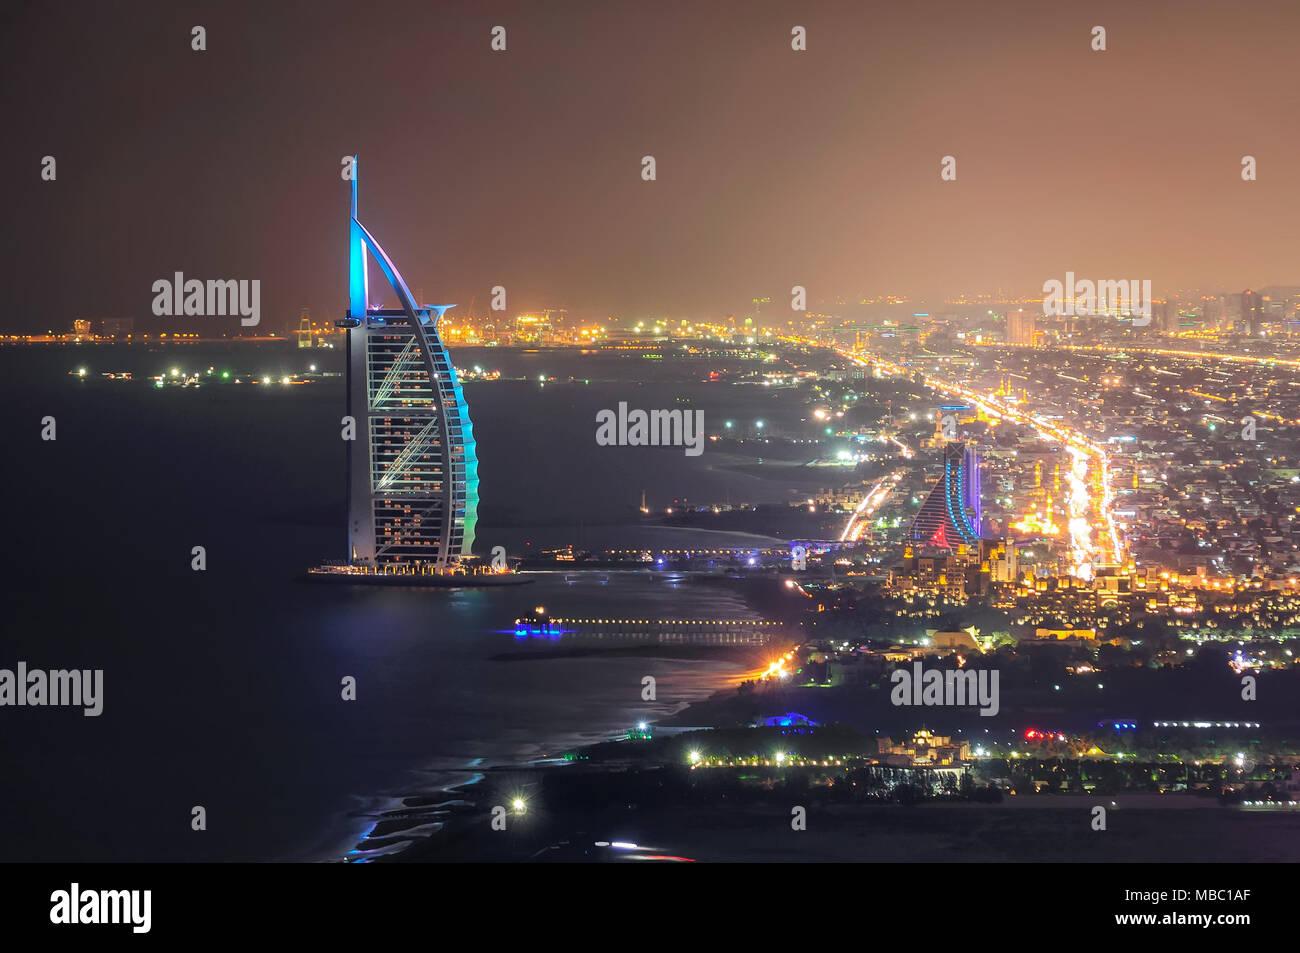 DUBAI, UAE - MAR 18, 2014: Famous Jumeirah beach view with 7 star hotel Burj Al Arab, Dubai, United Arab Emirates - Stock Image